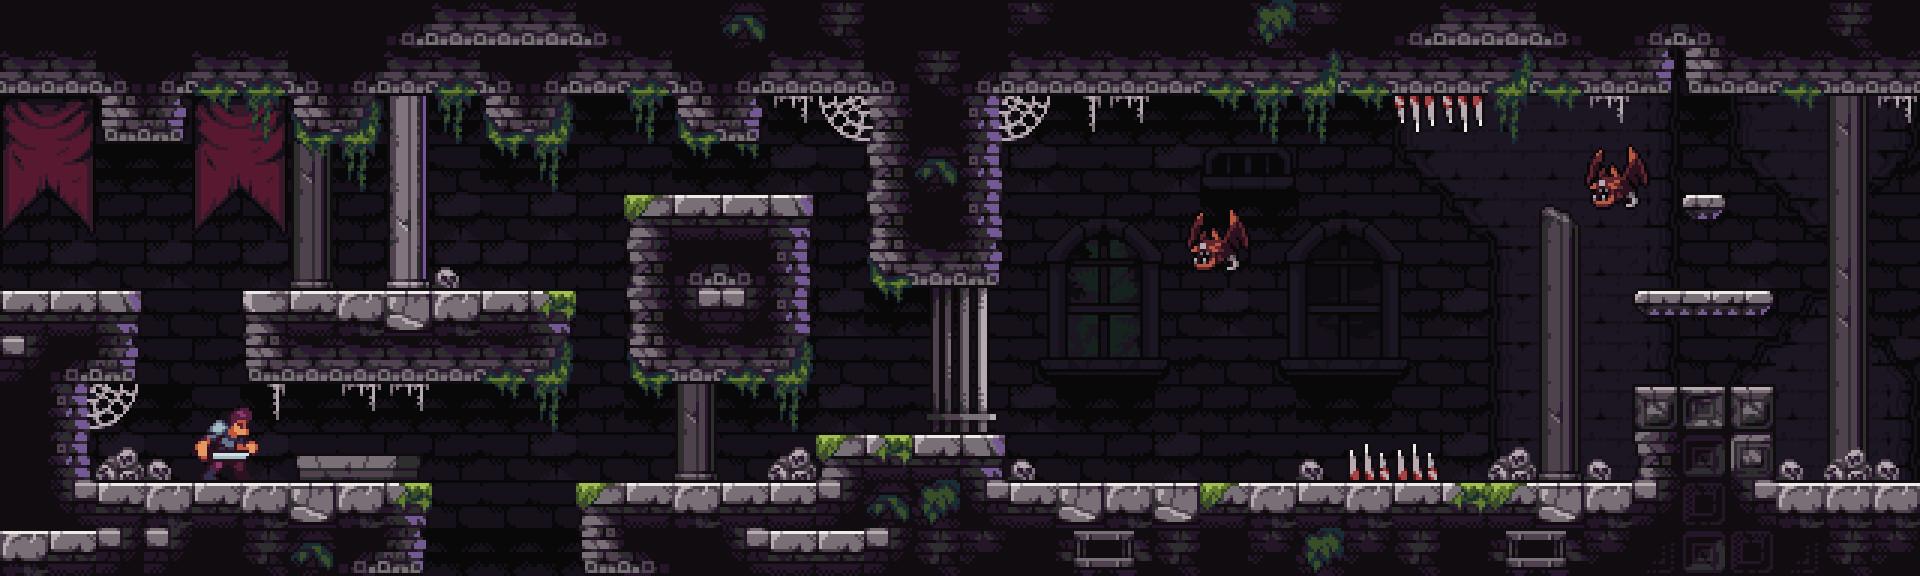 ArtStation - Castle Dungeon - Pixel Art asset pack, Nauris Amatnieks